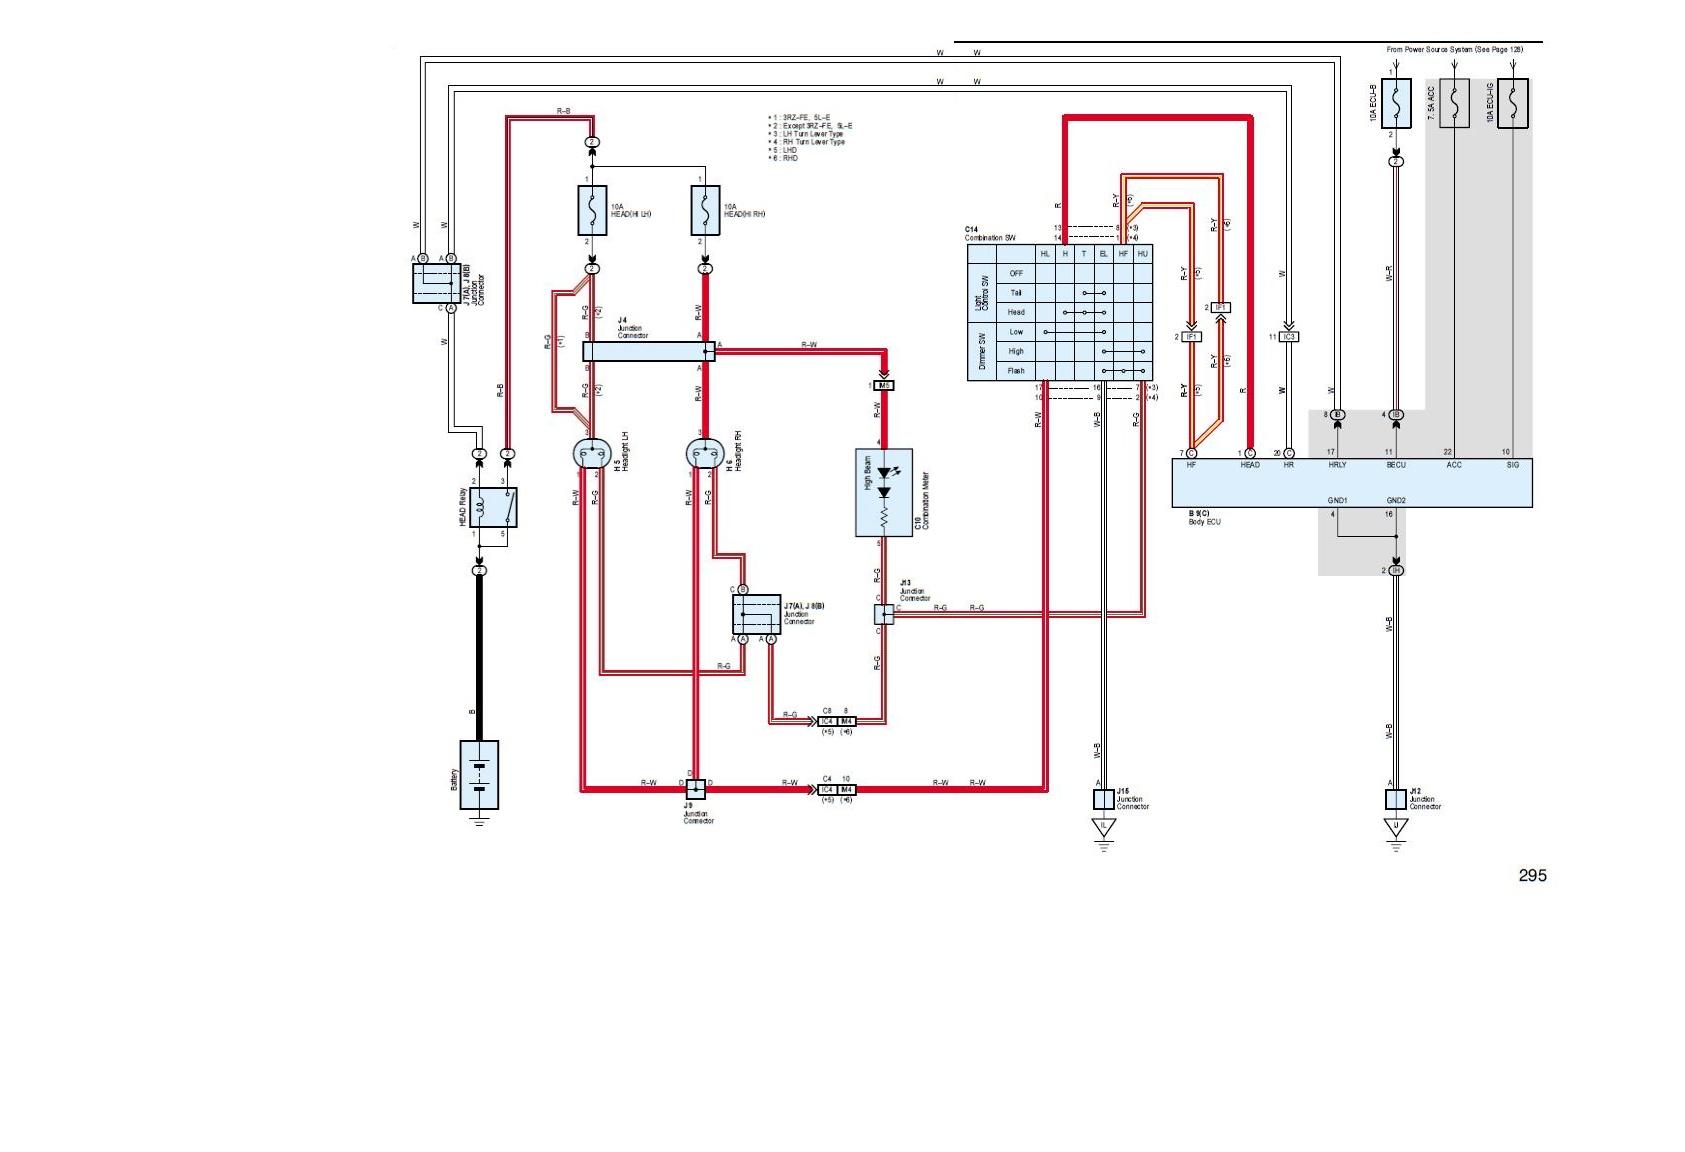 схема отключения света фар при выключении зажигания